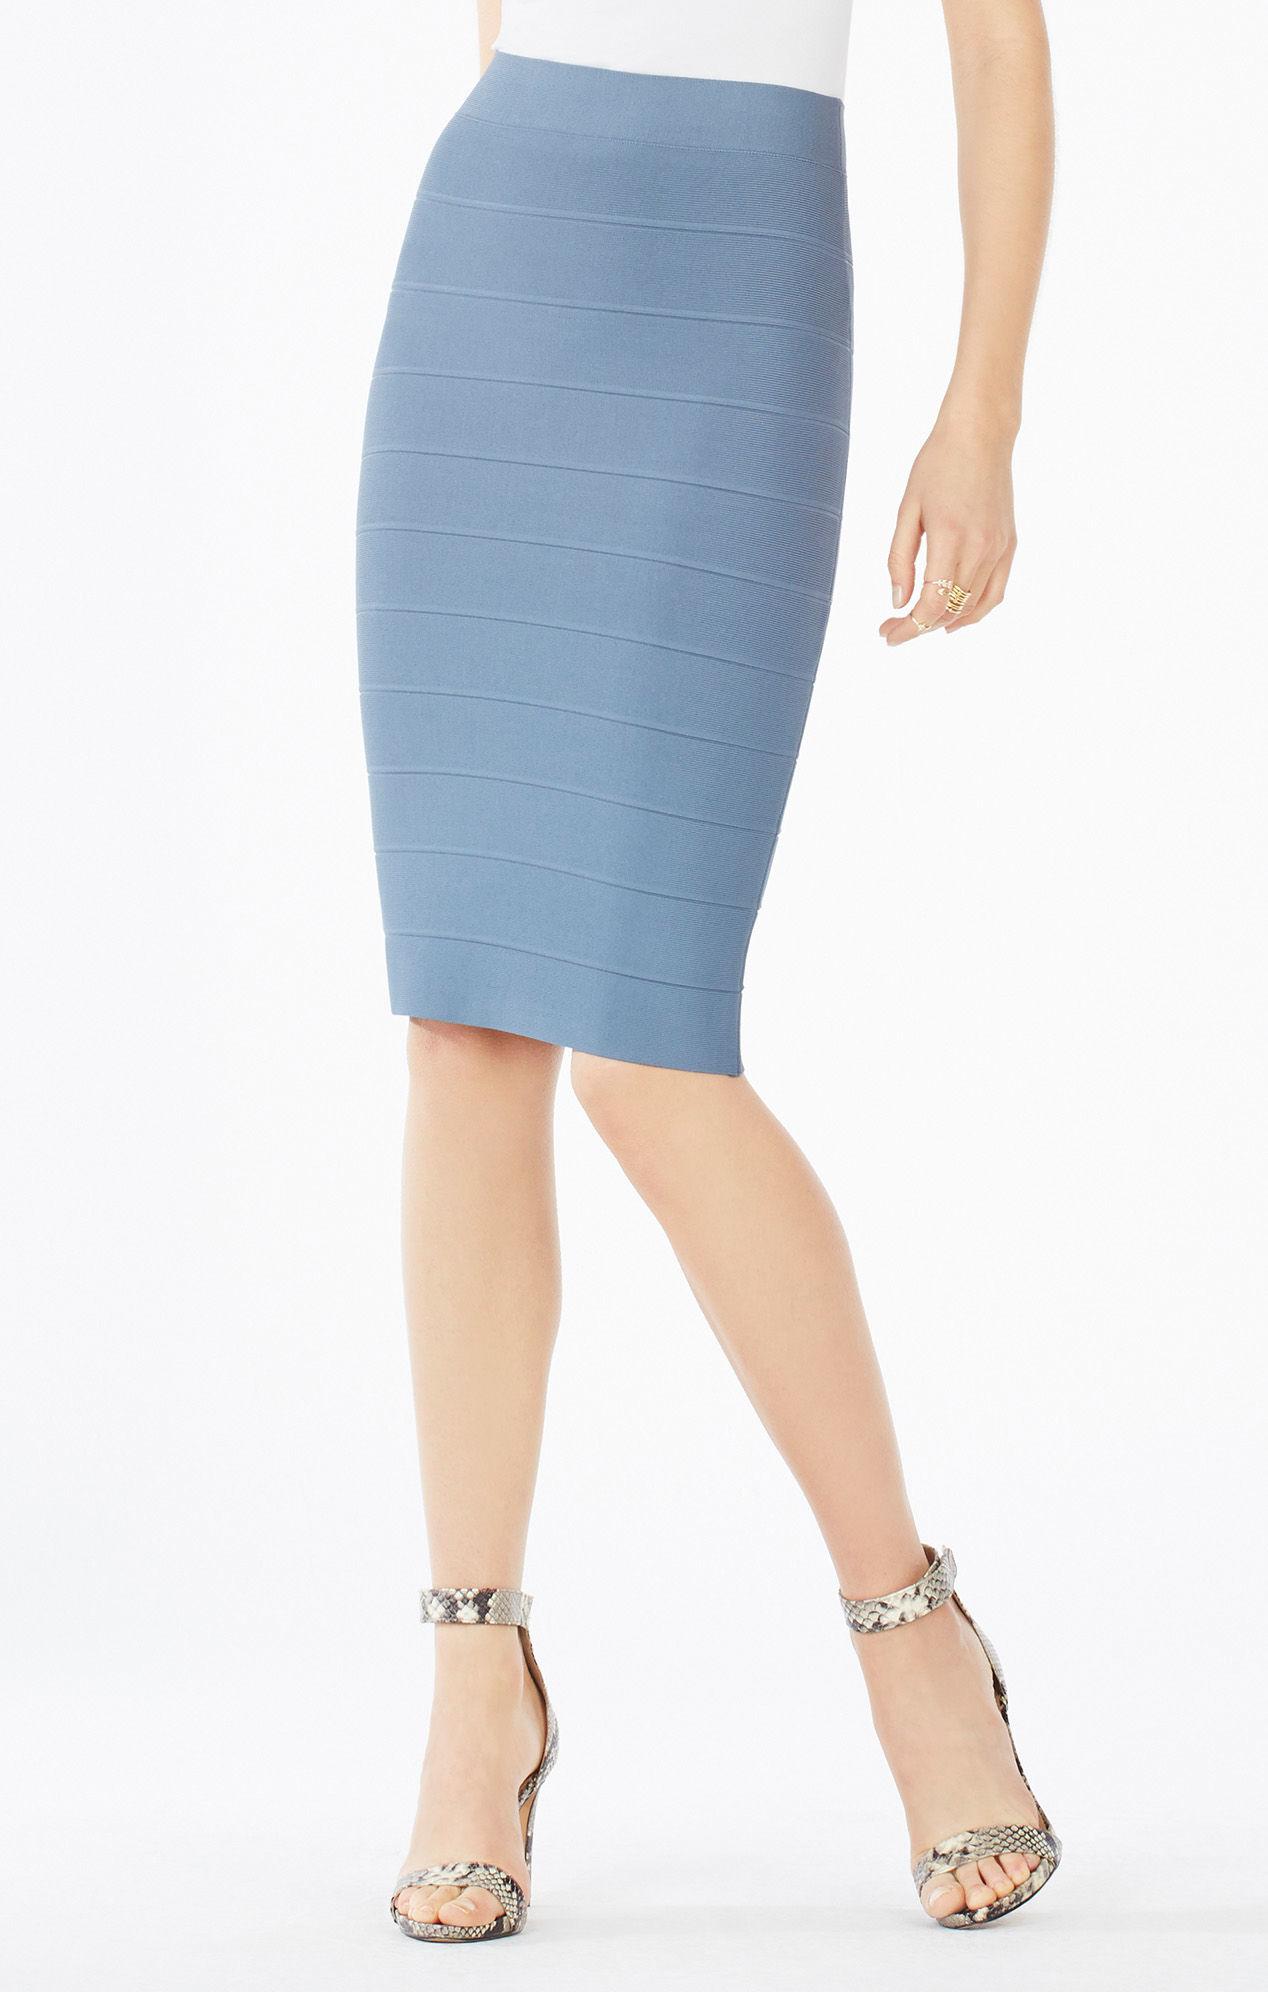 Bcbgmaxazria Pencil Skirt in Blue | Lyst